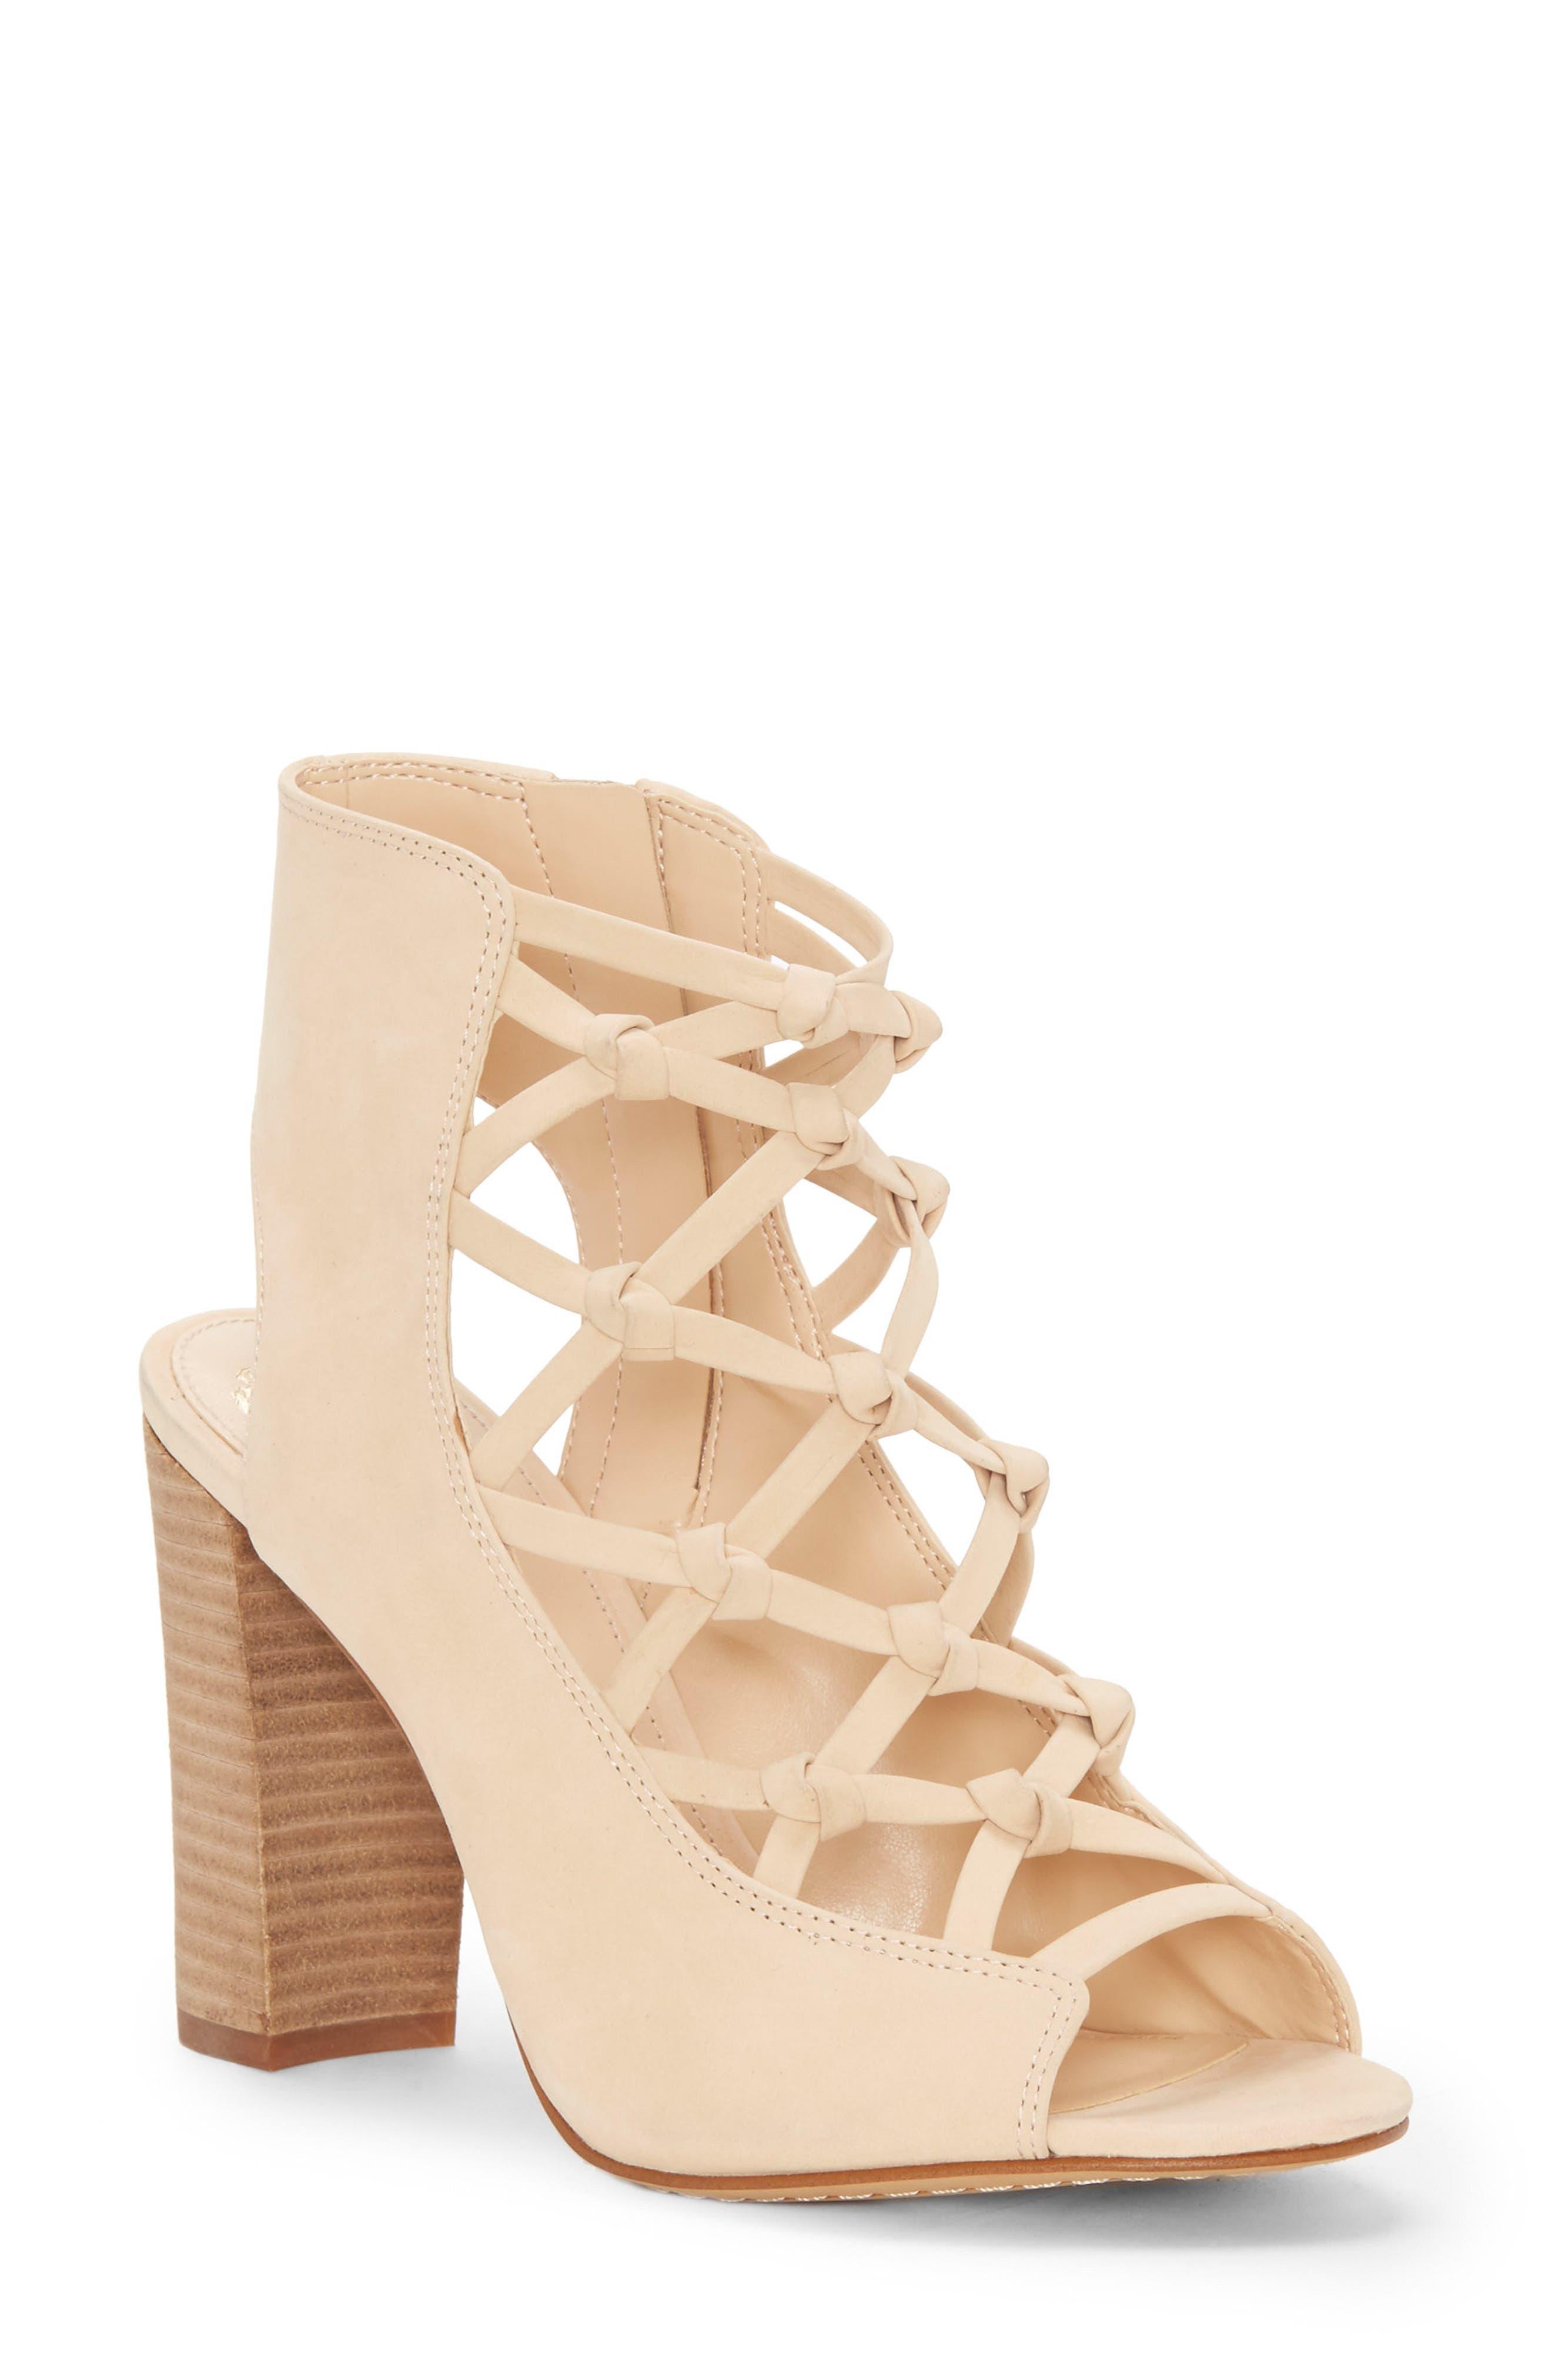 Stesha Sandal,                         Main,                         color, Beauty Leather